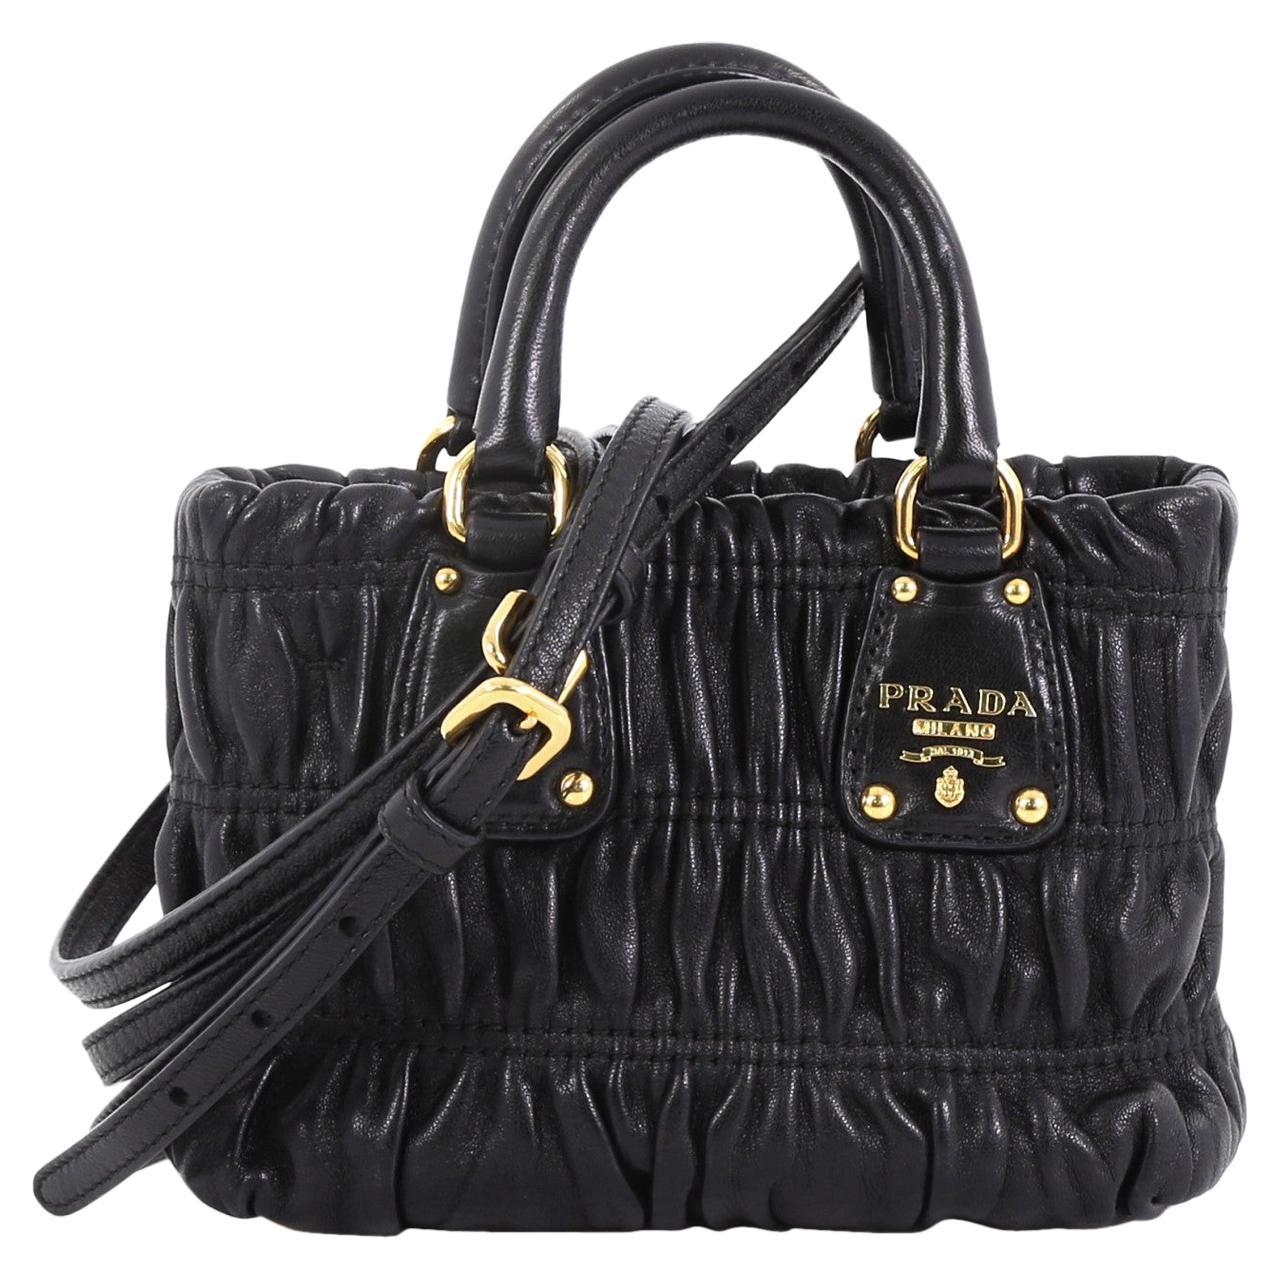 8b7a1a62f8cf Vintage Prada Handbags and Purses - 1,246 For Sale at 1stdibs